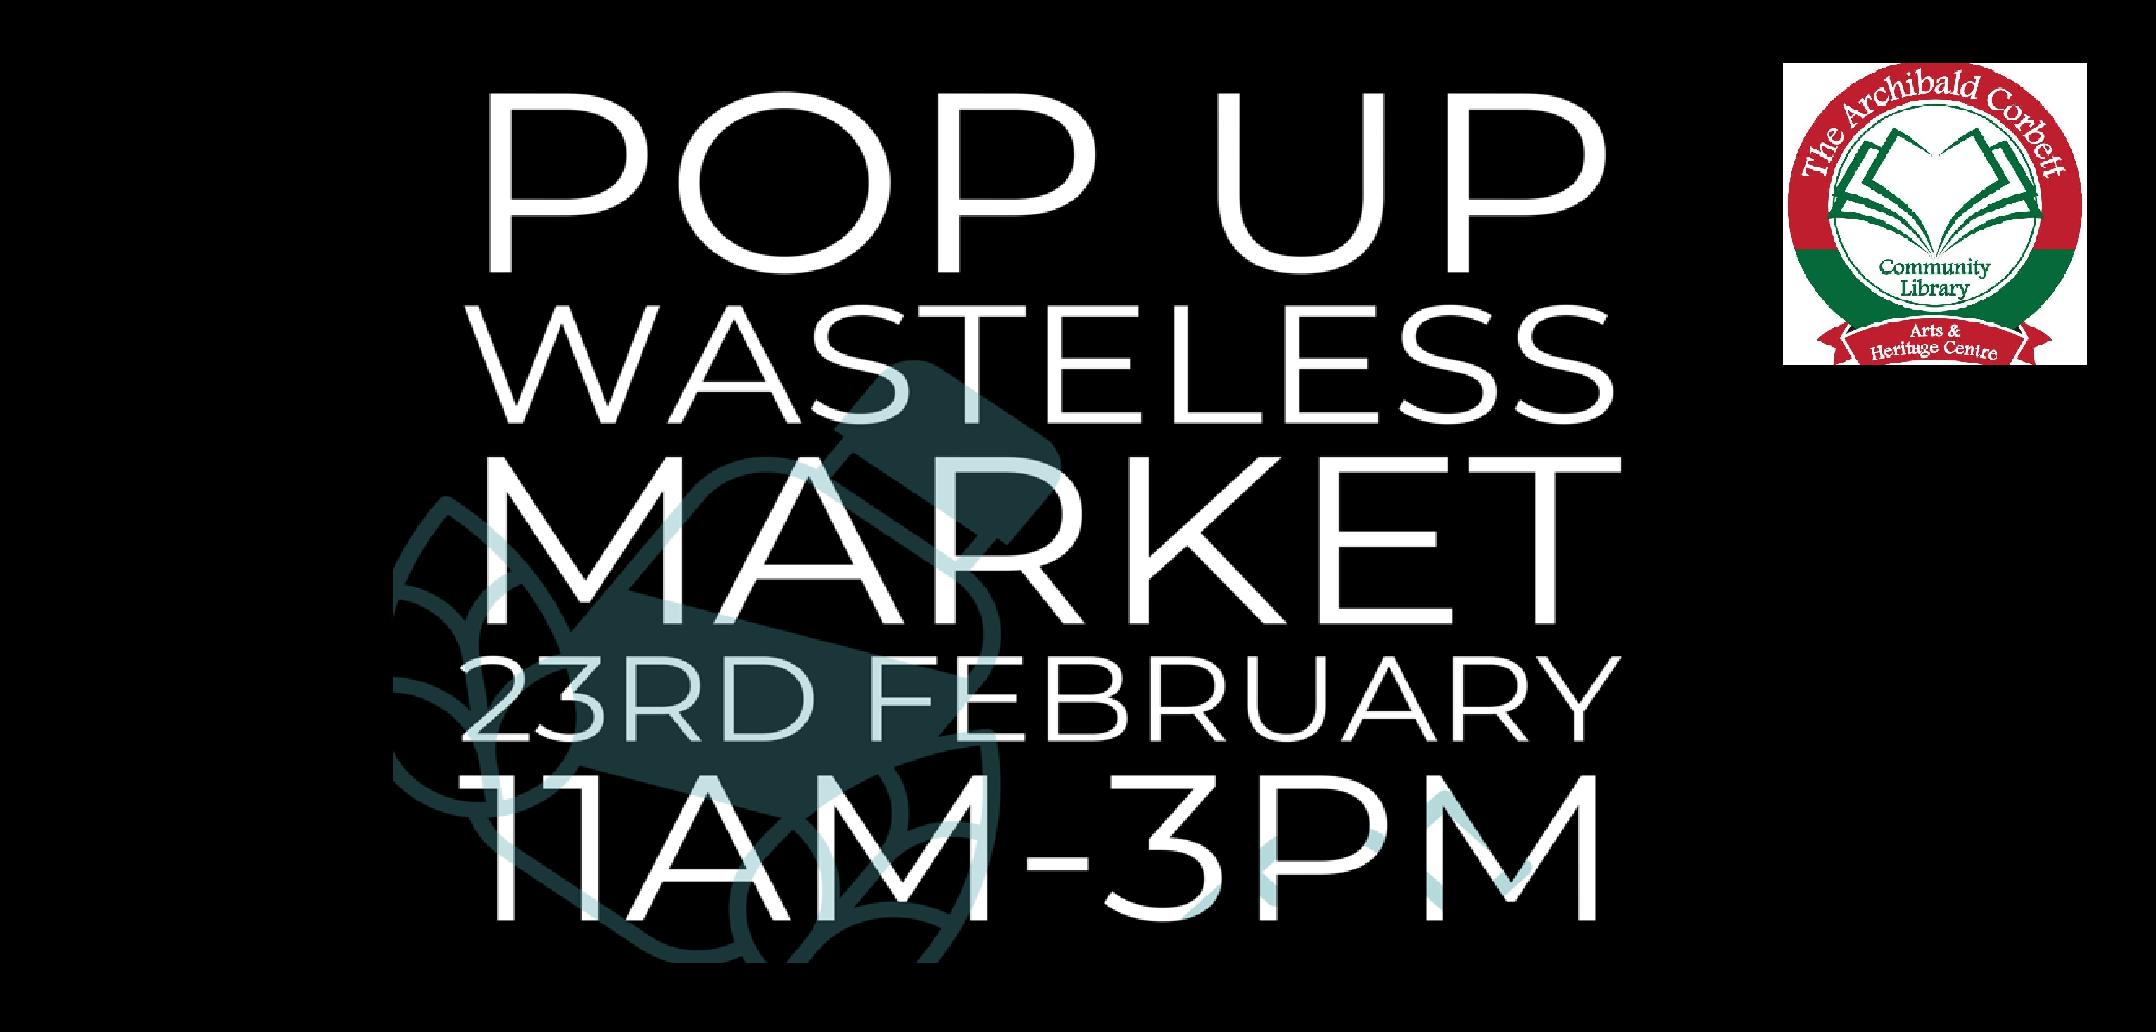 Pop Up Wasteless Market – Corbett Community Library